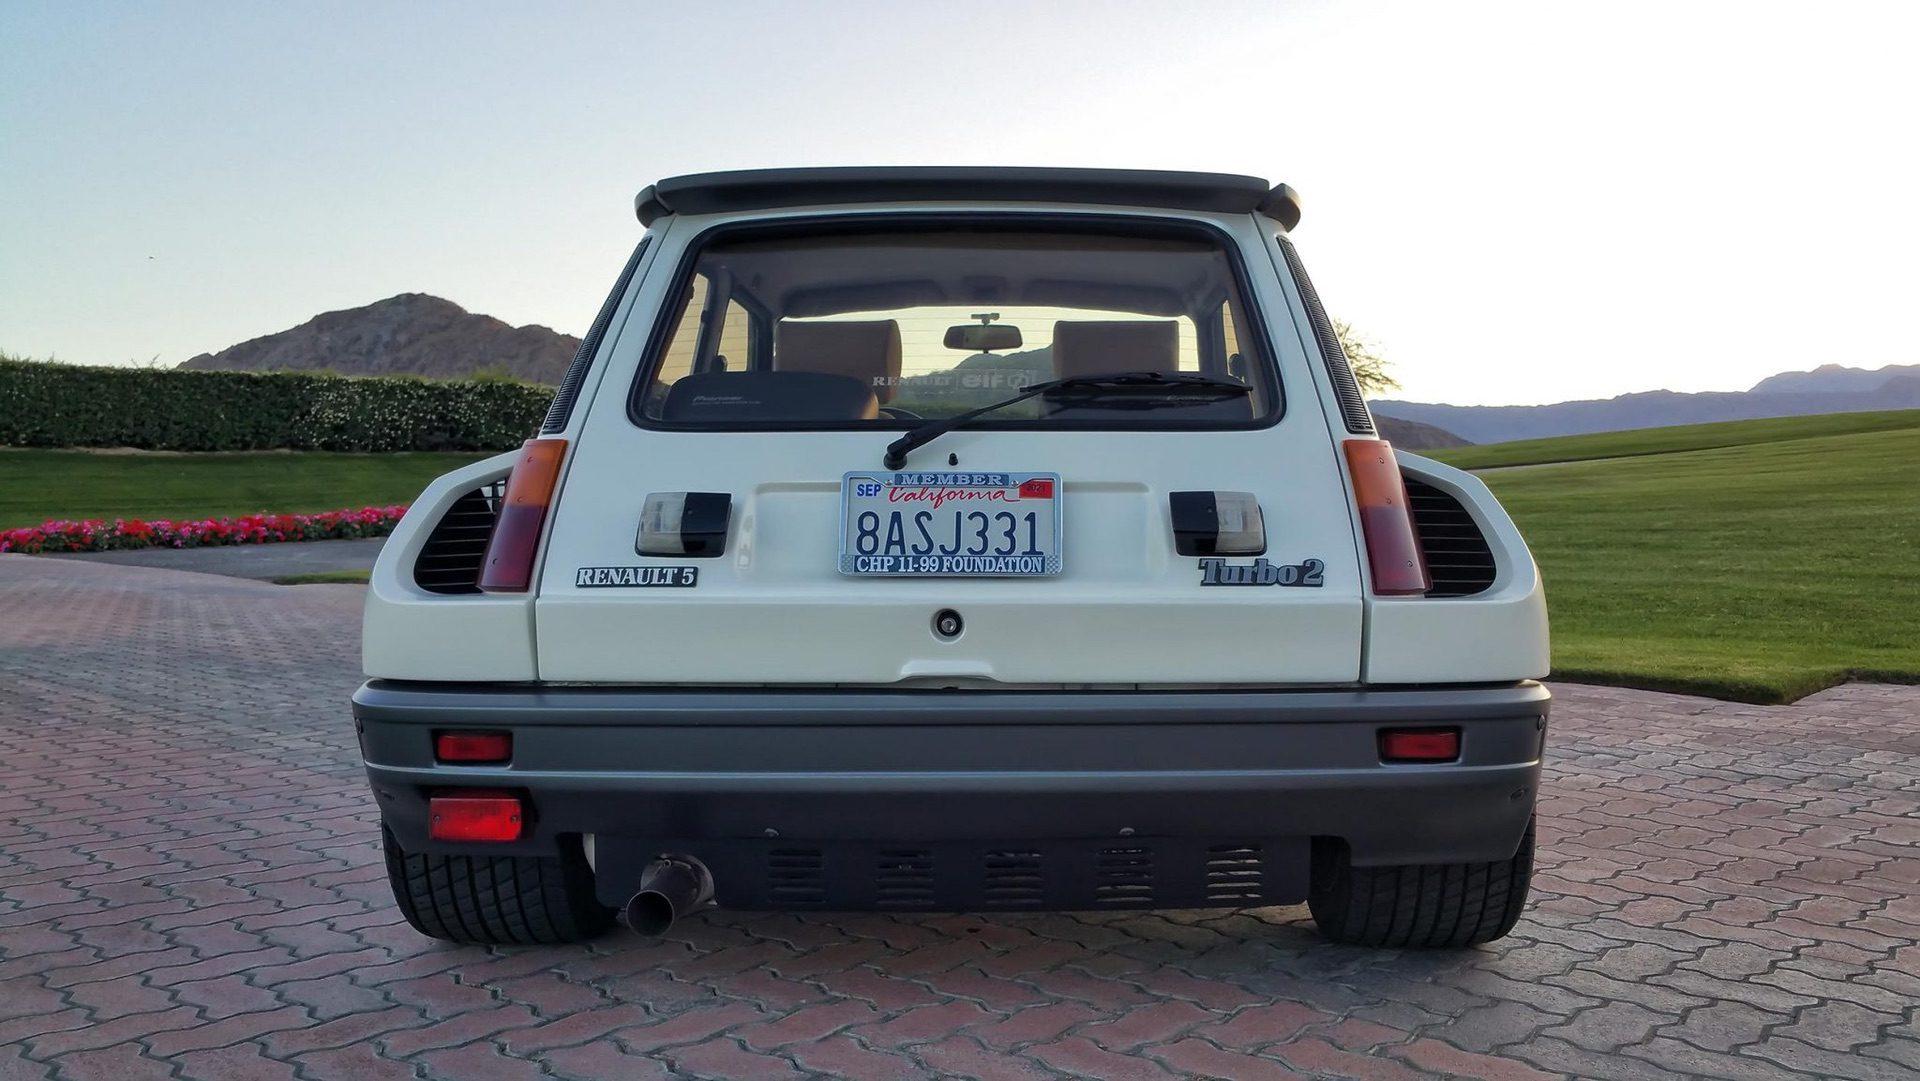 1985_Renault_R5_Turbo_2_rotary-0037